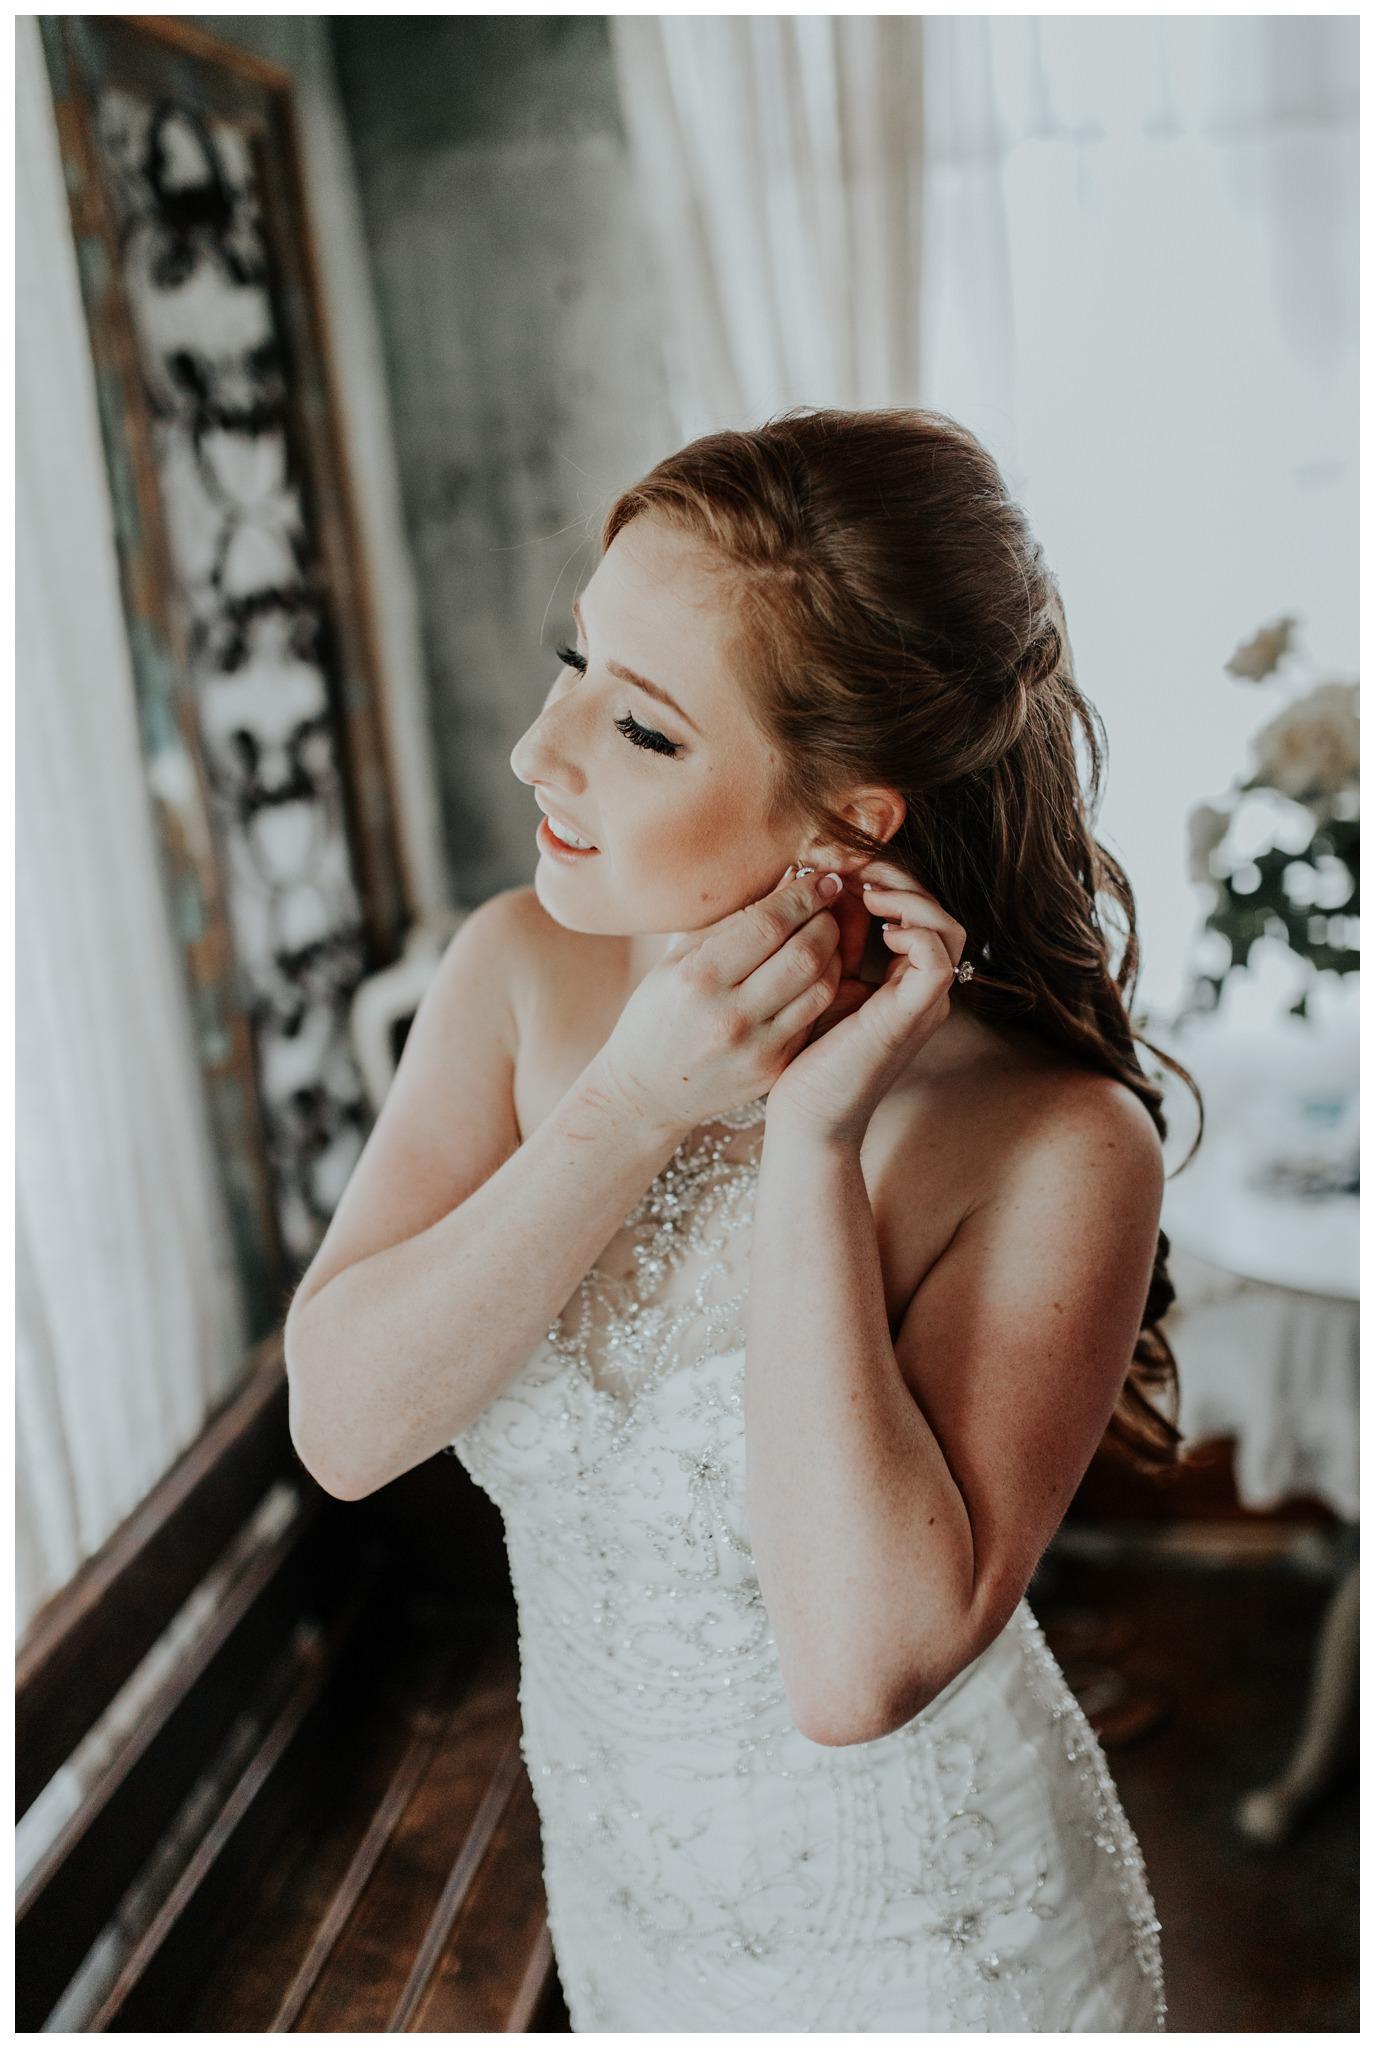 Summertime Olde Dobbin Station - Magnolia Wedding - The Woodlands Texas Wedding Photographer-2359.jpg